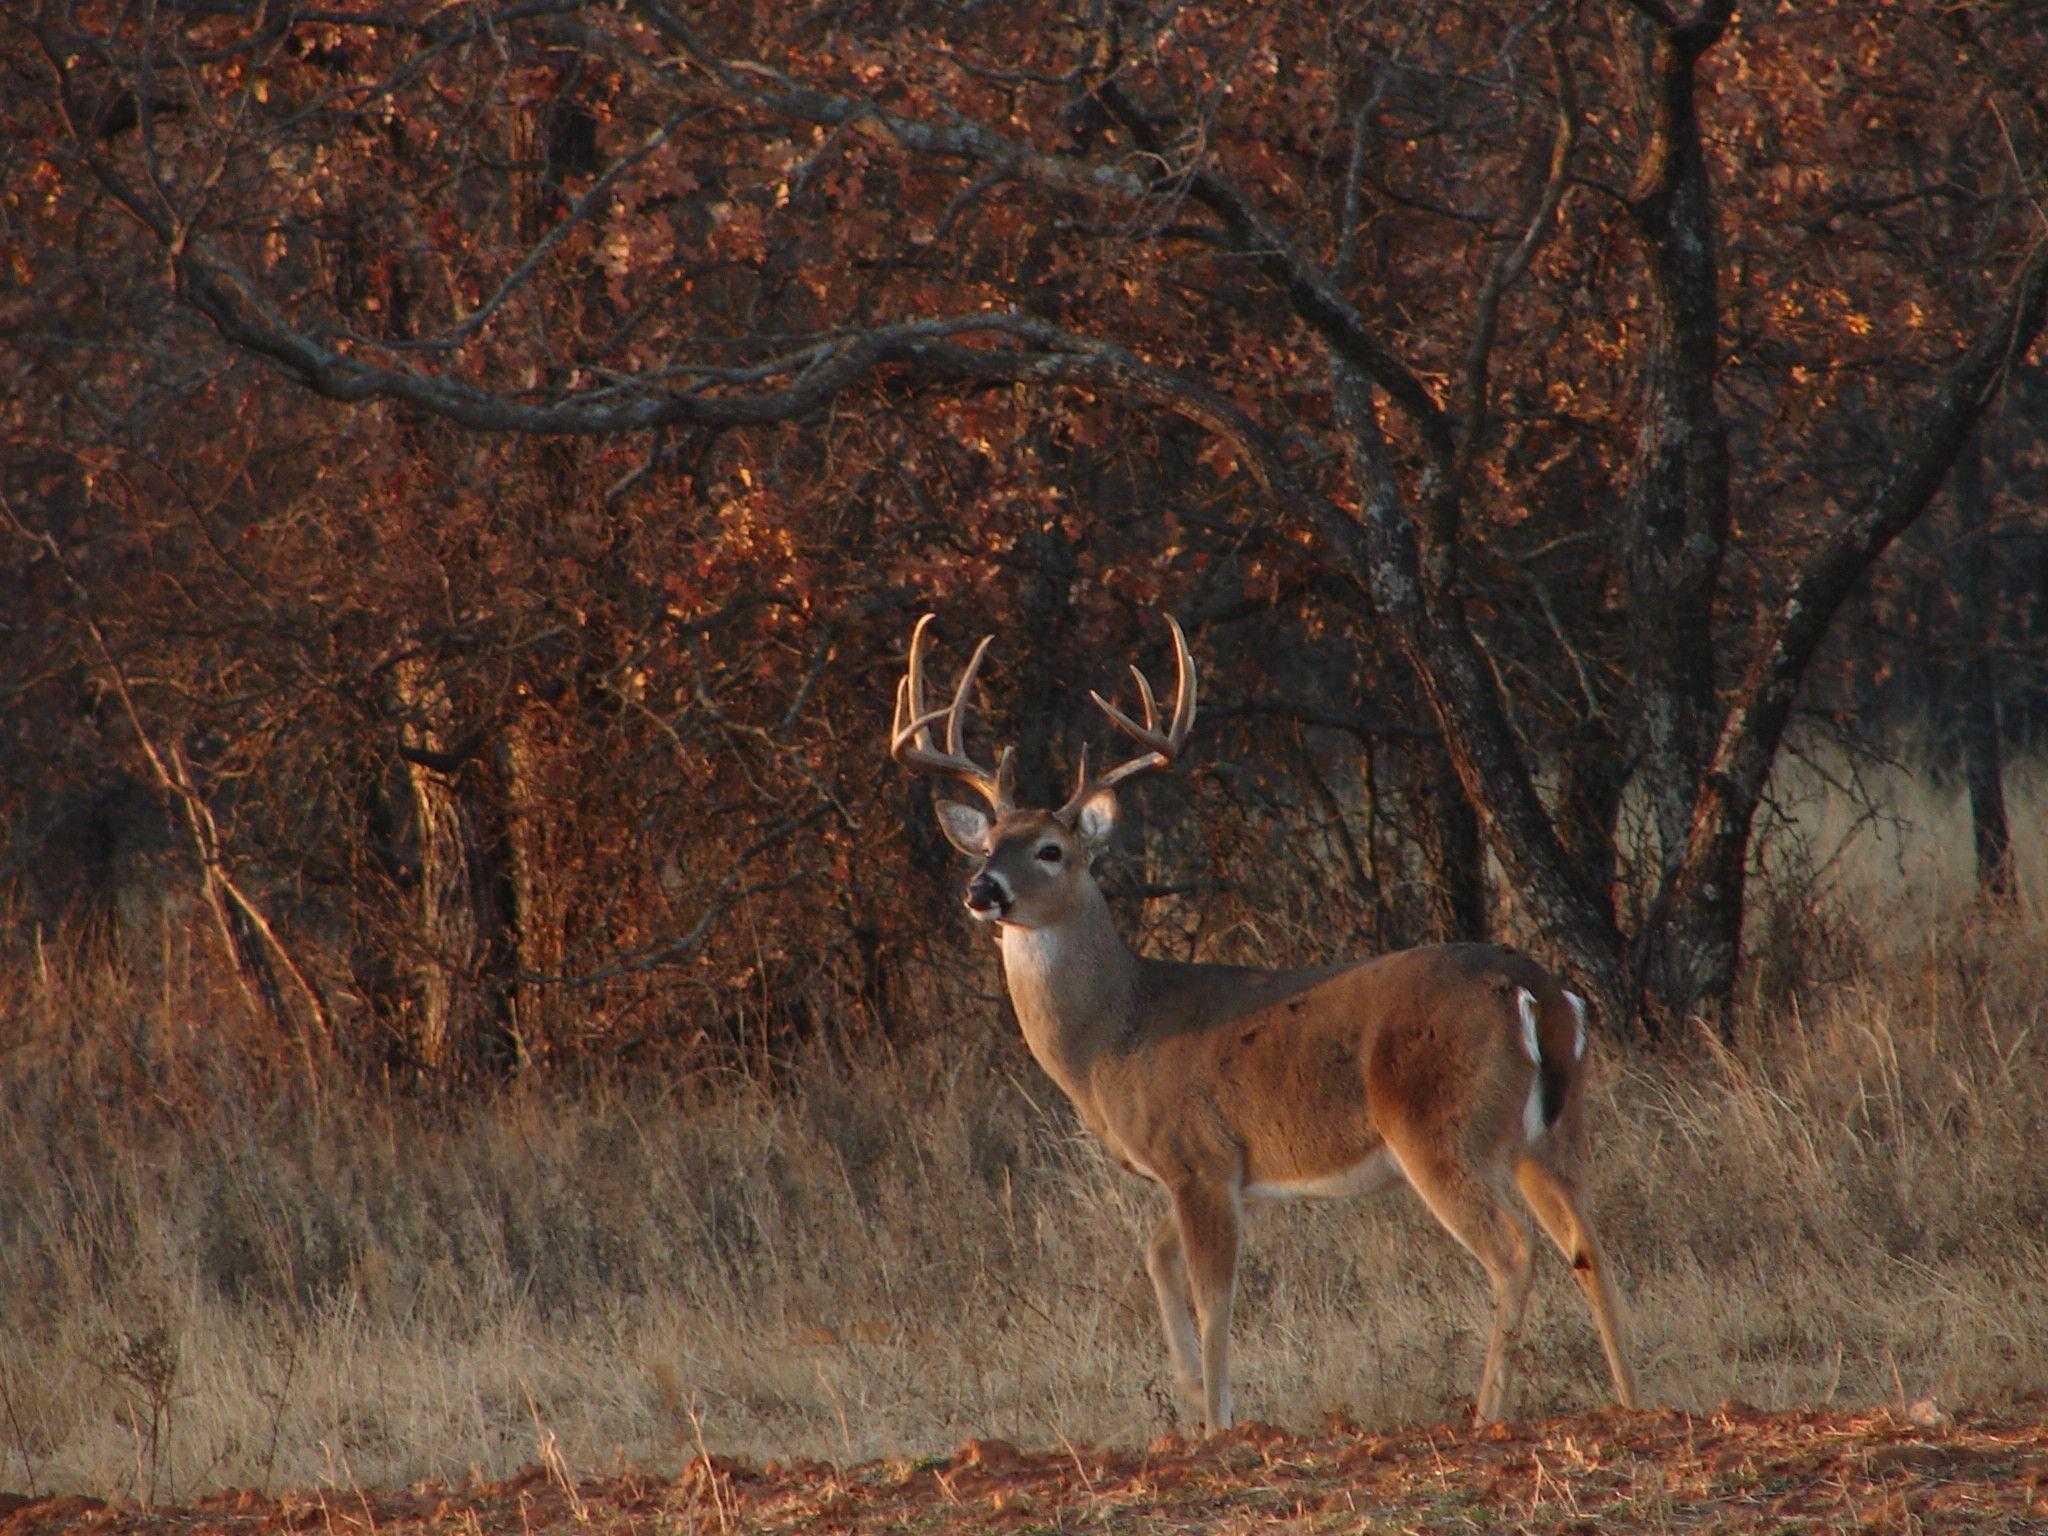 Deer Hunting Wallpapers Top Free Deer Hunting Backgrounds Wallpaperaccess